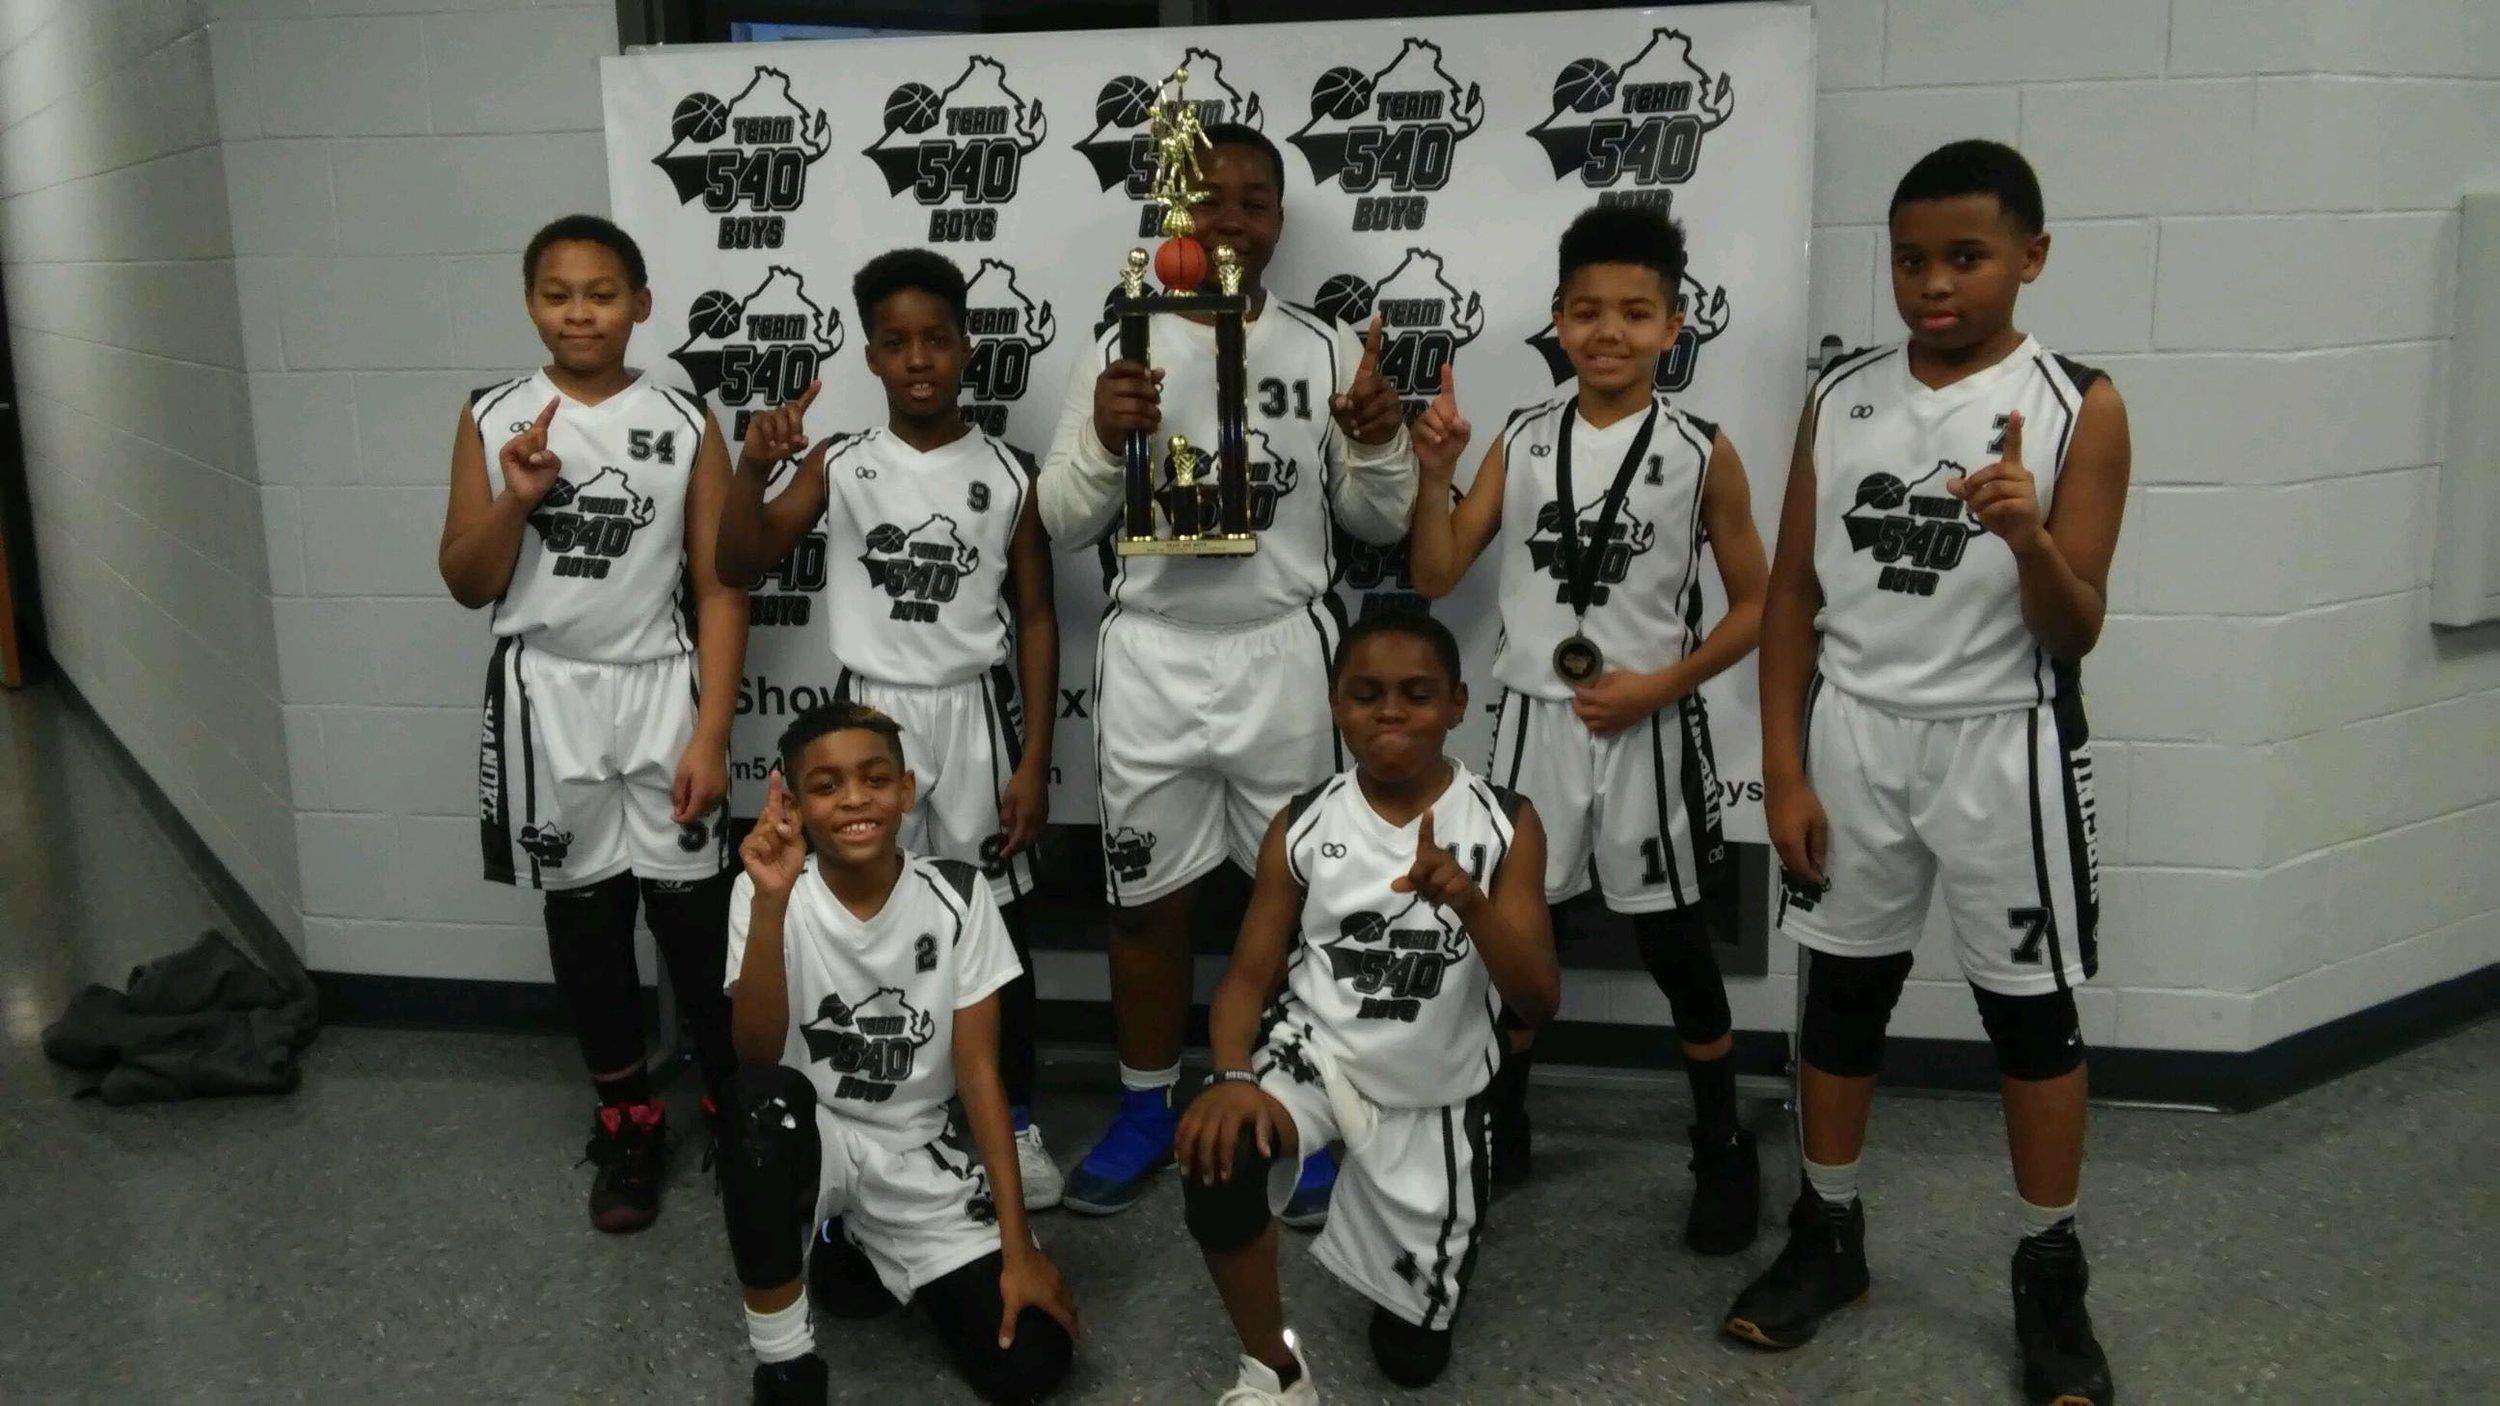 Youth 540 BOYS White Black basketball uniforms, jerseys, and shorts